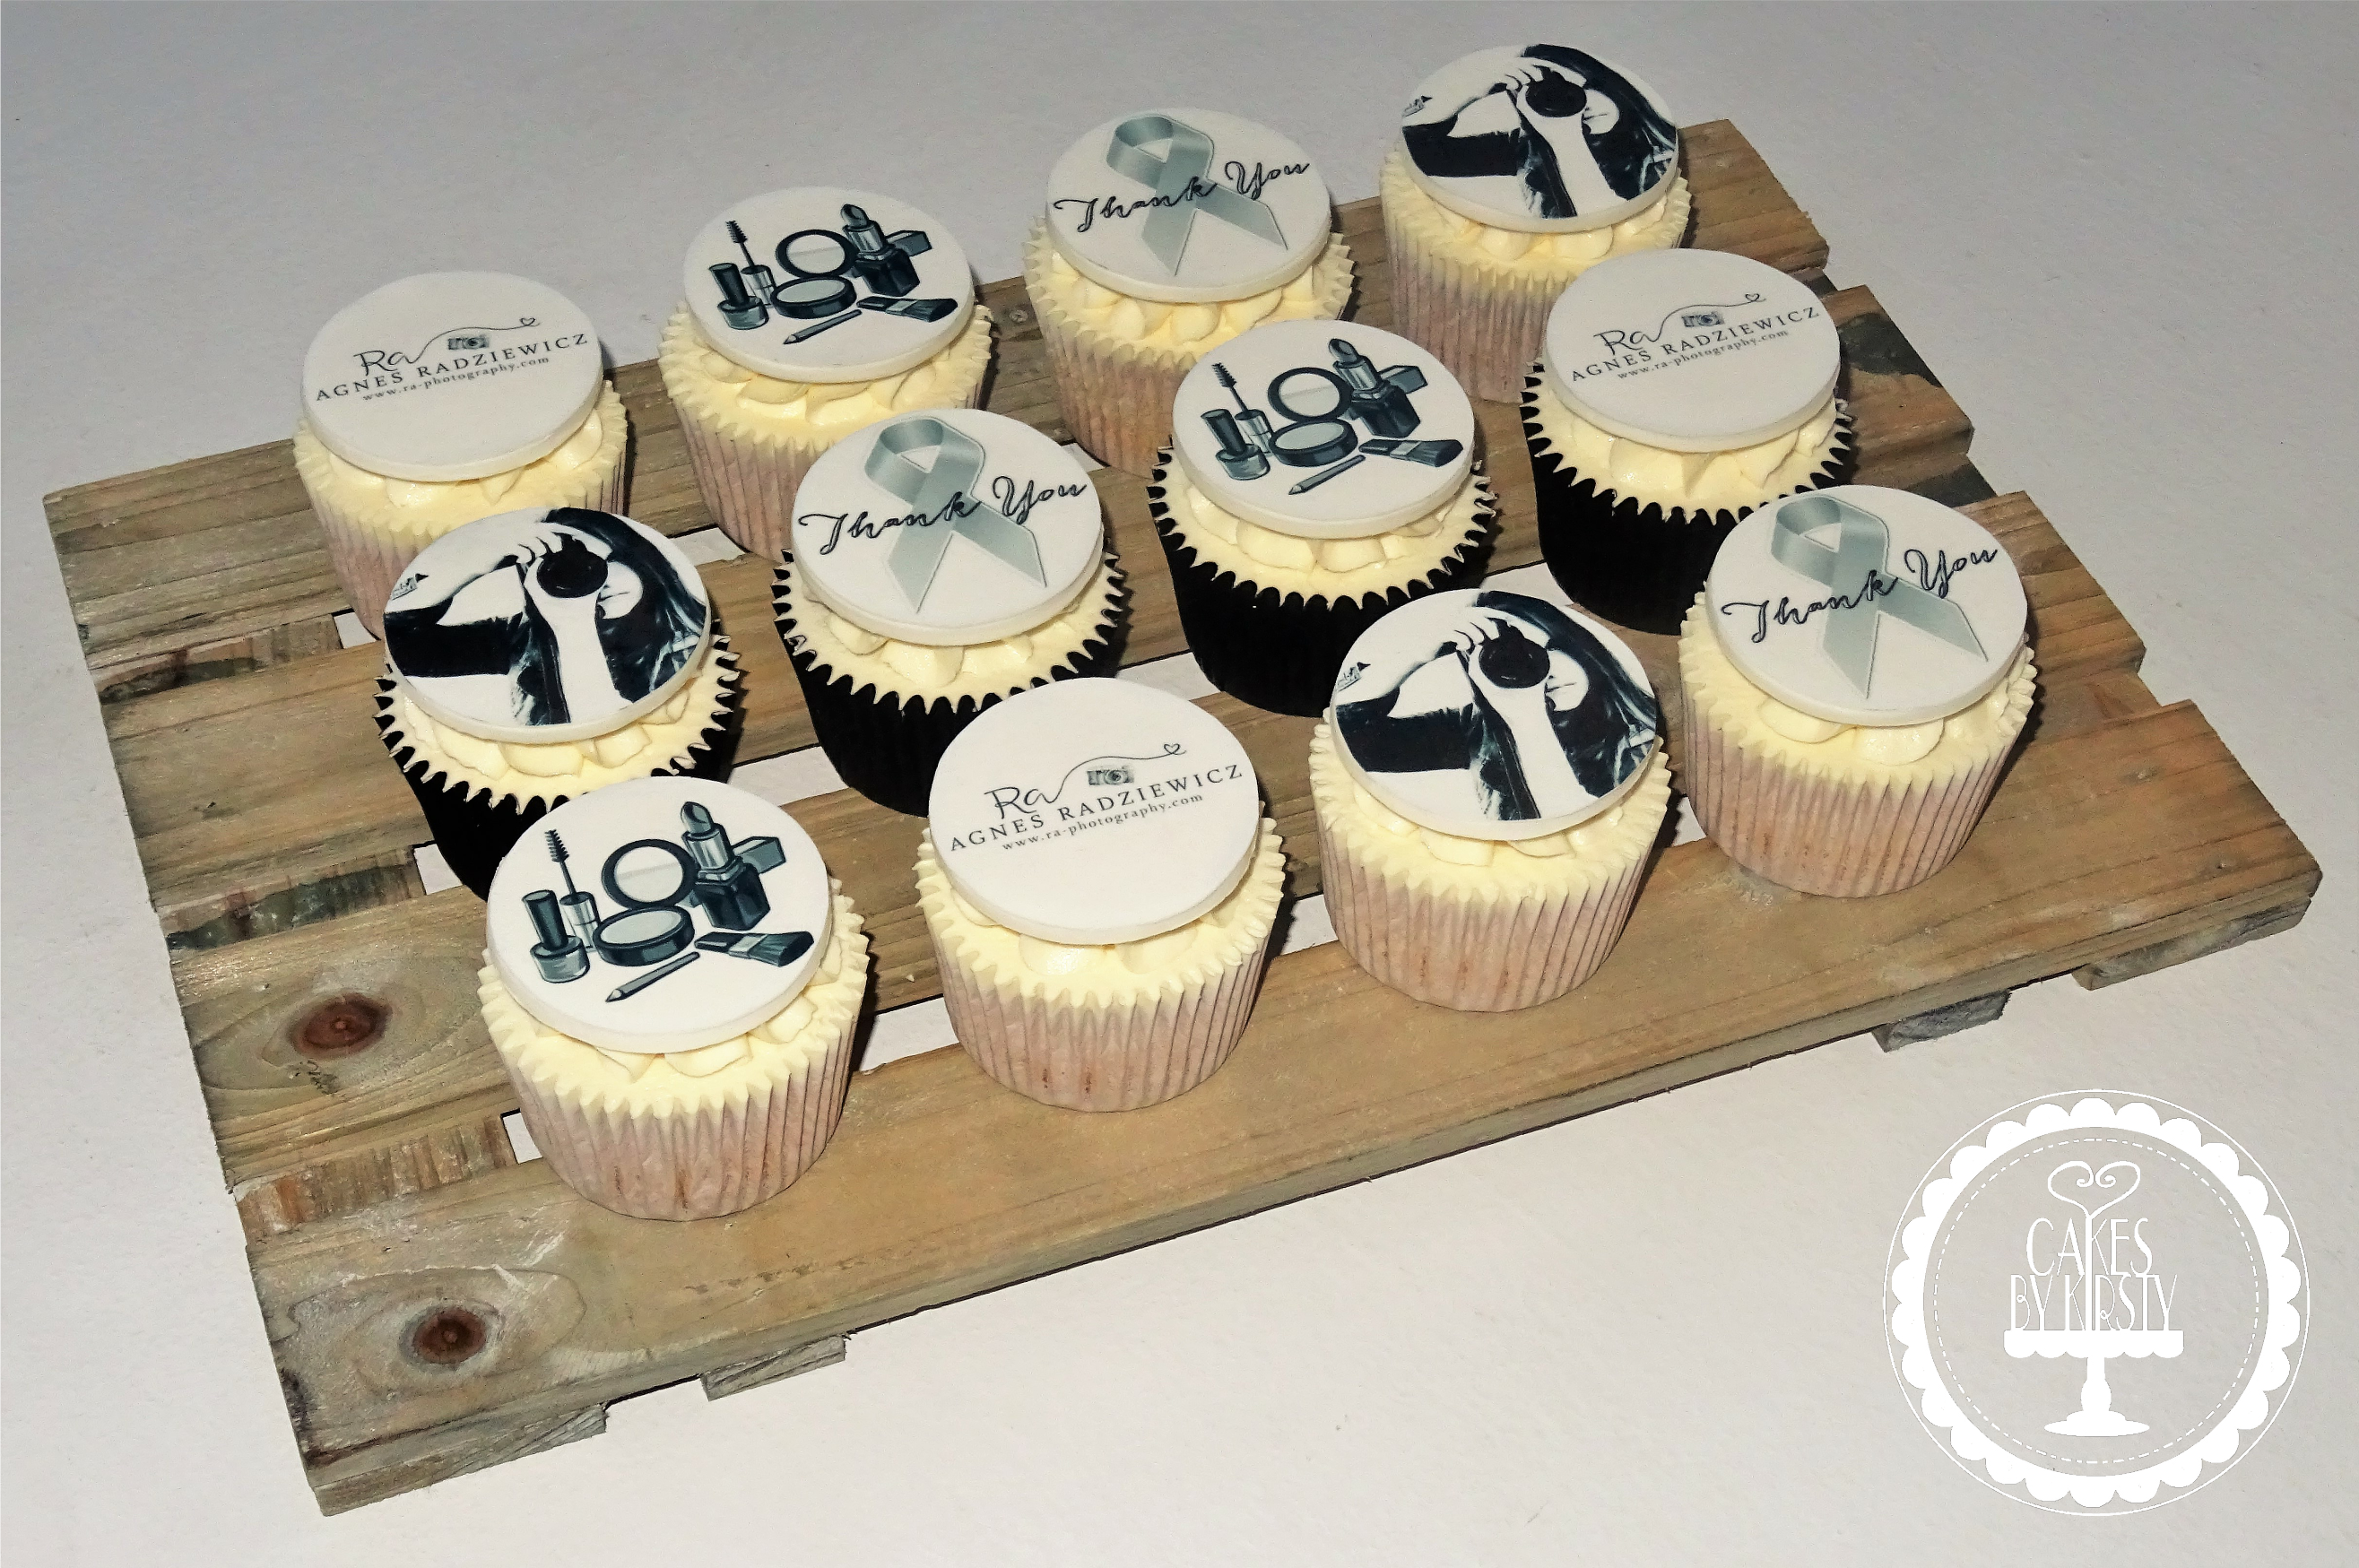 RA Photography - Logo Cupcakes